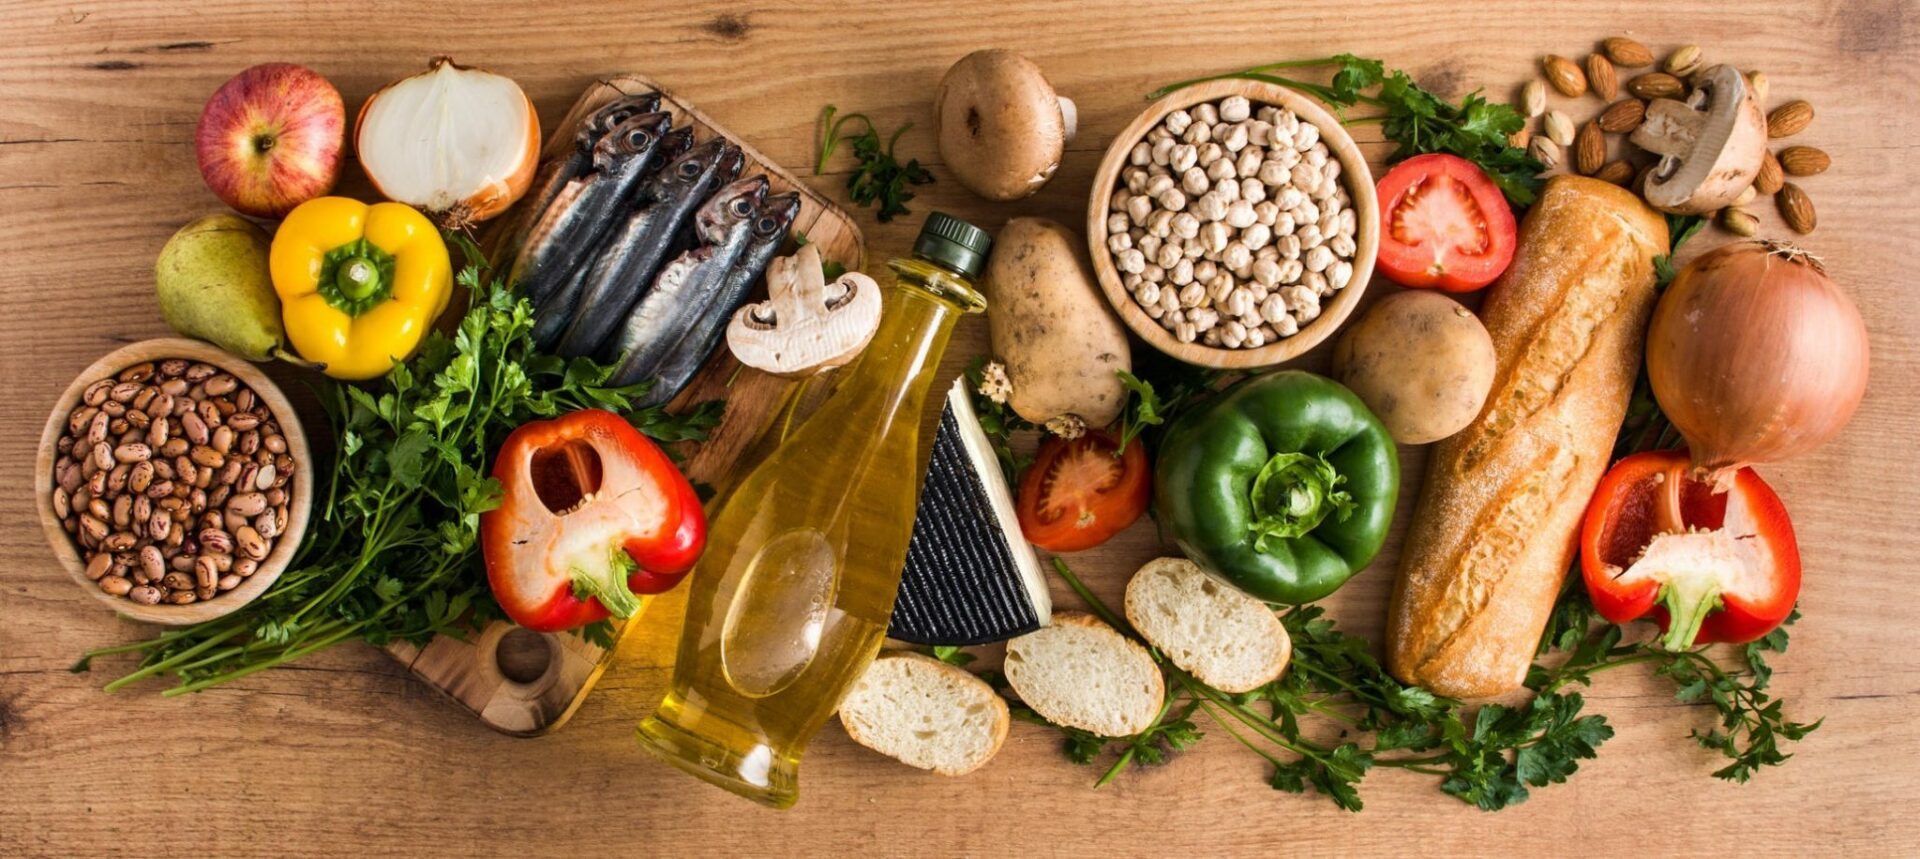 complejo vitaminico dieta sana